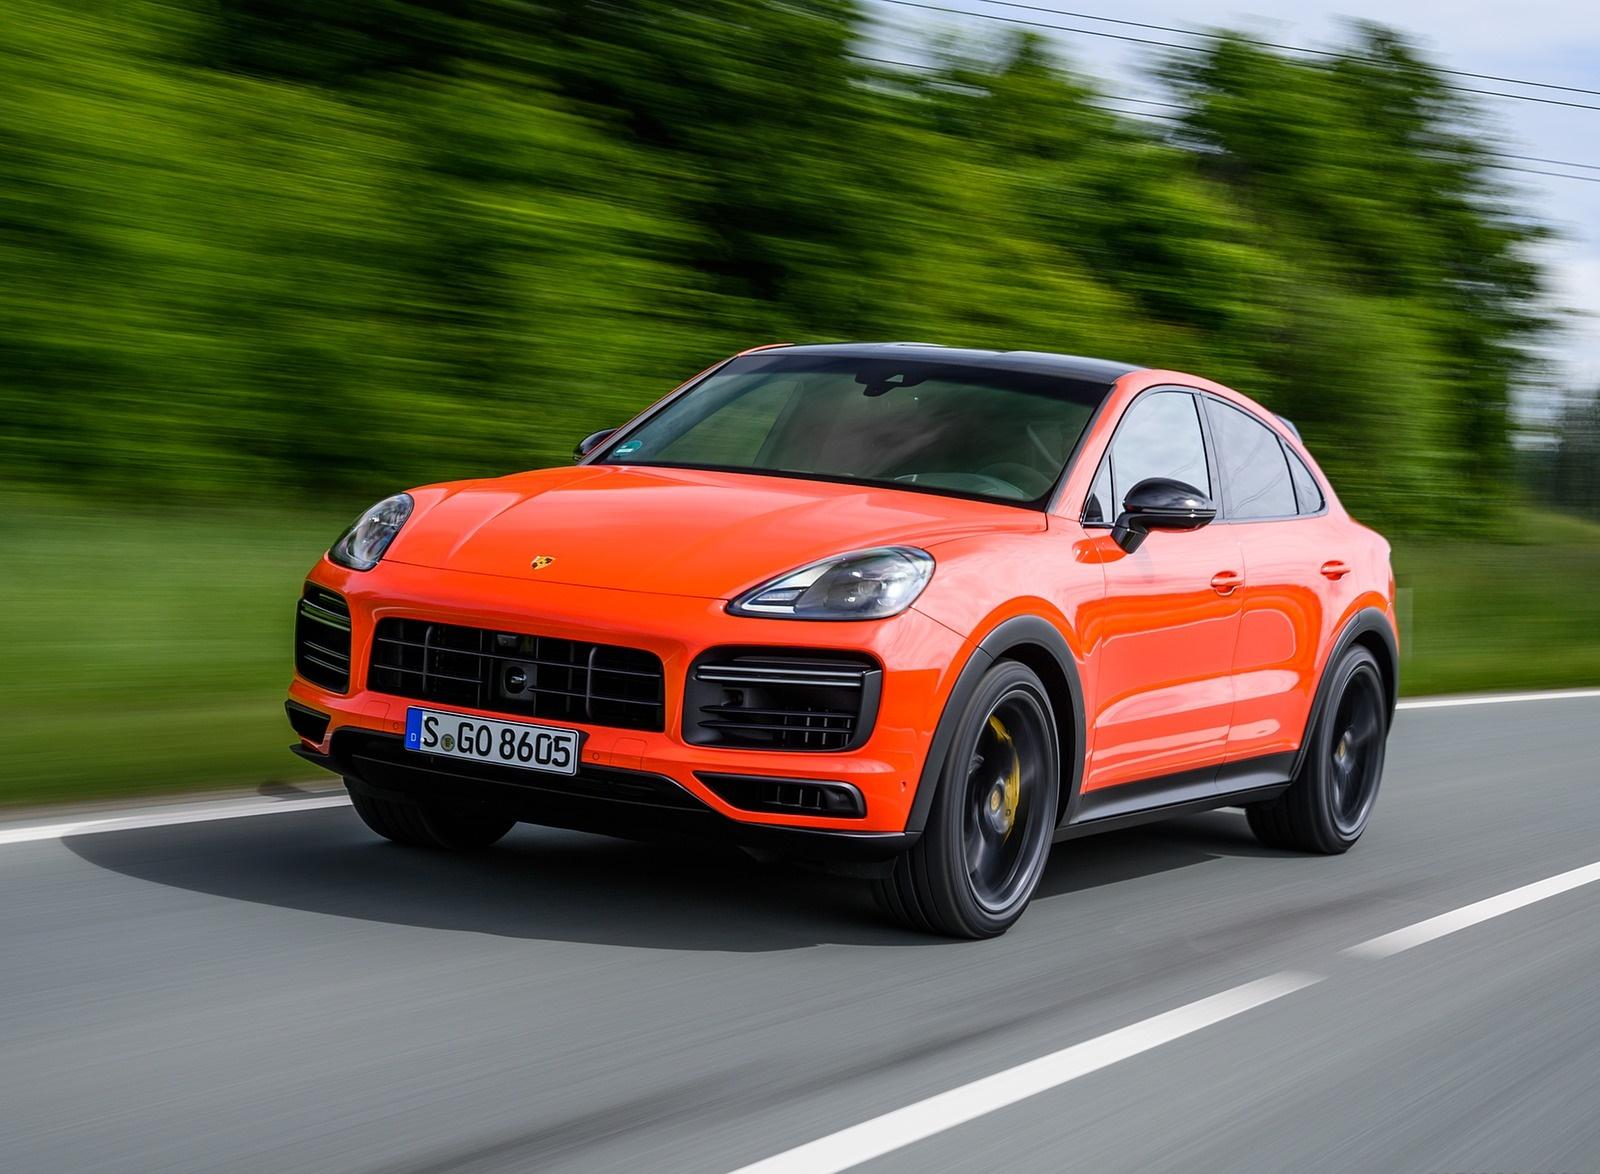 2020 Porsche Cayenne Turbo Coupe (Color: Lava Orange) Front Three-Quarter Wallpapers (2)